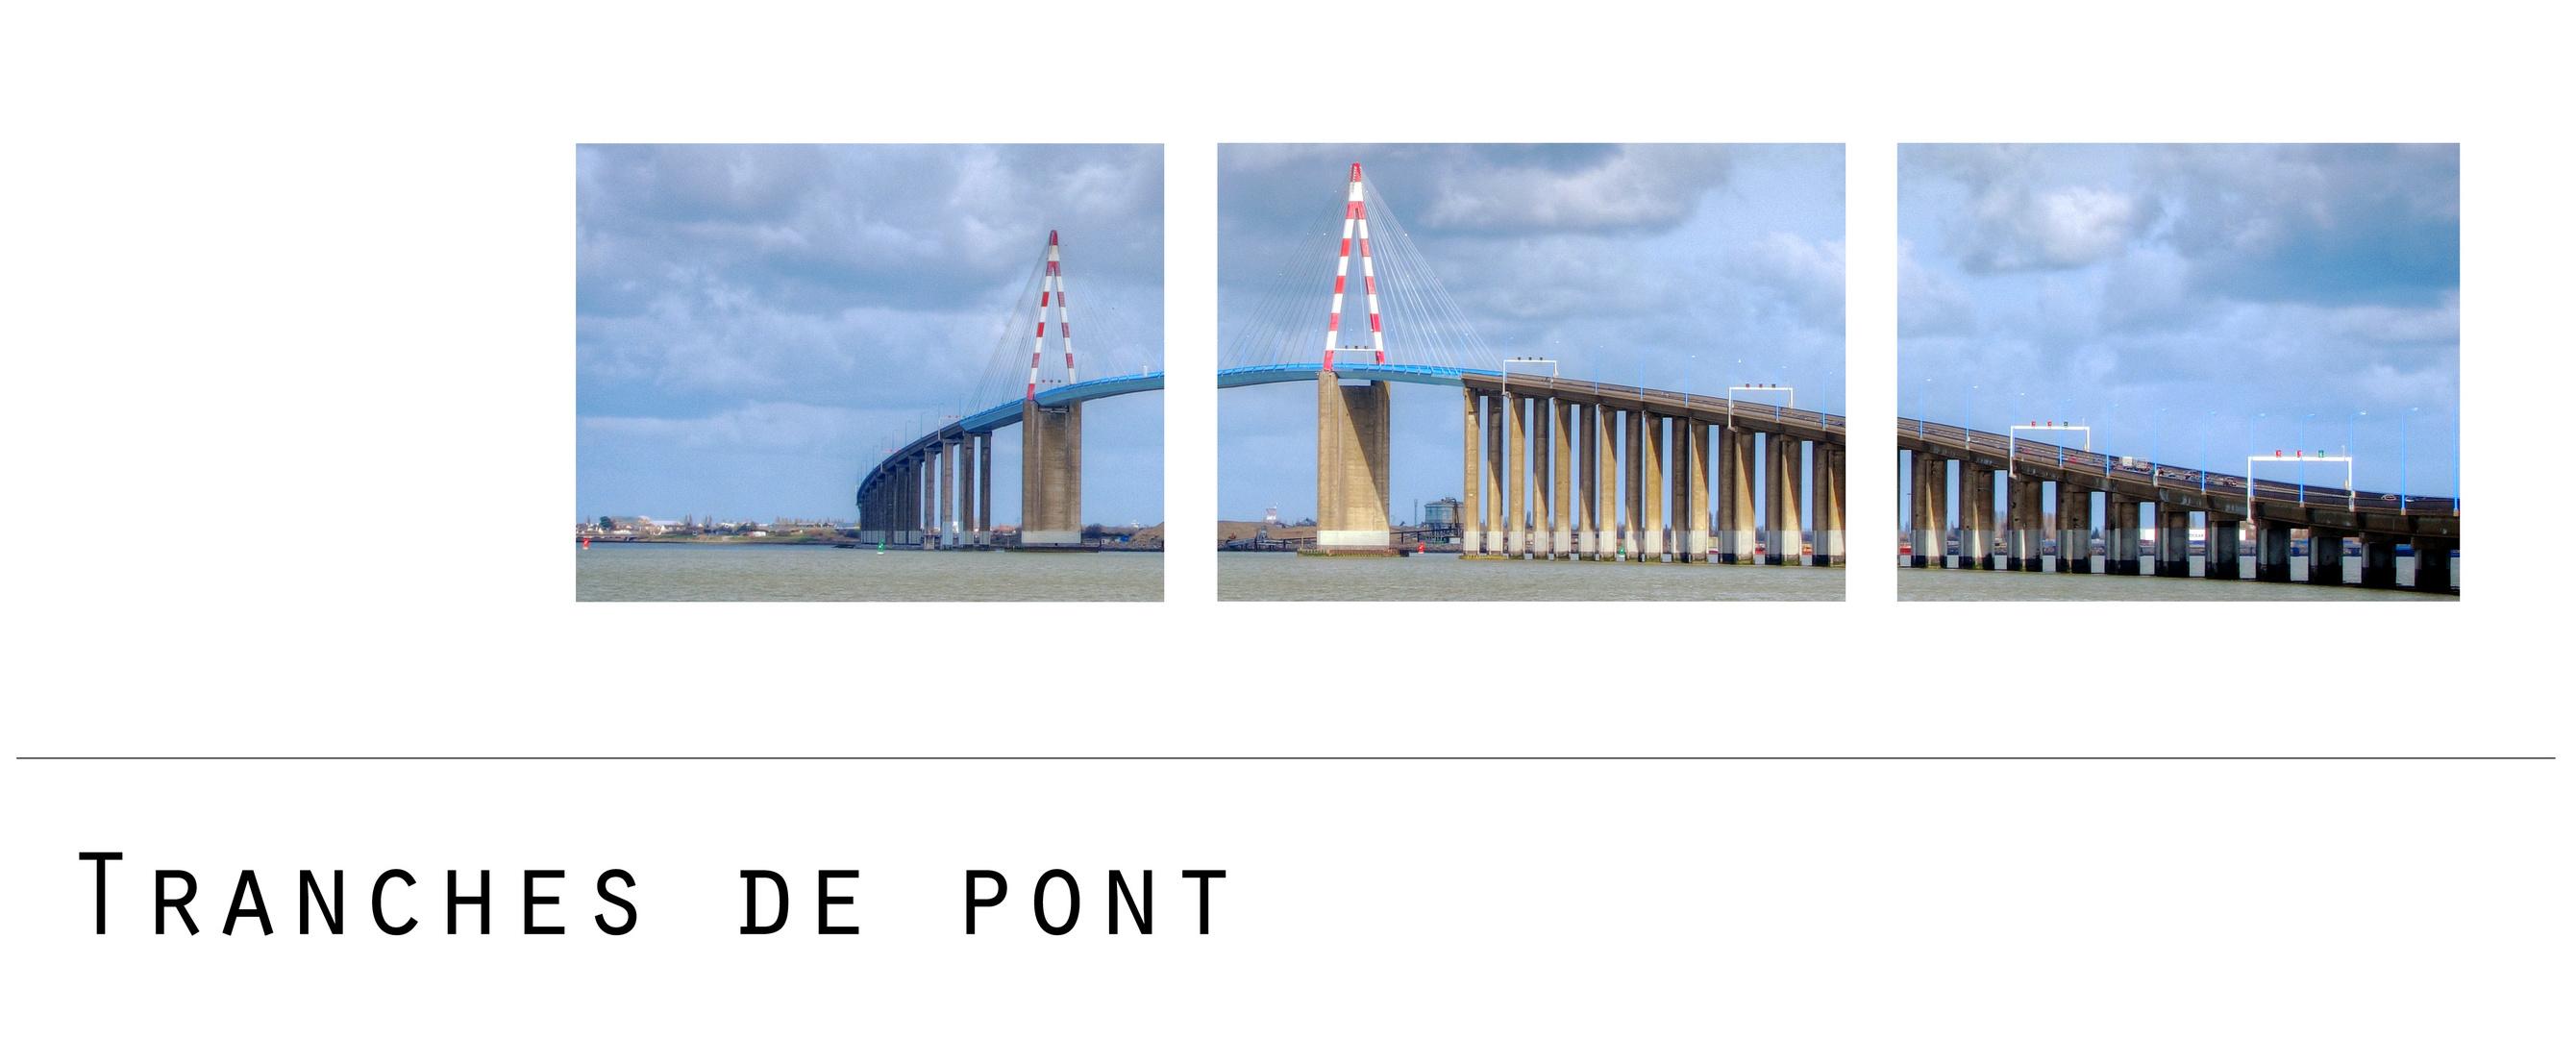 Tranches de pont